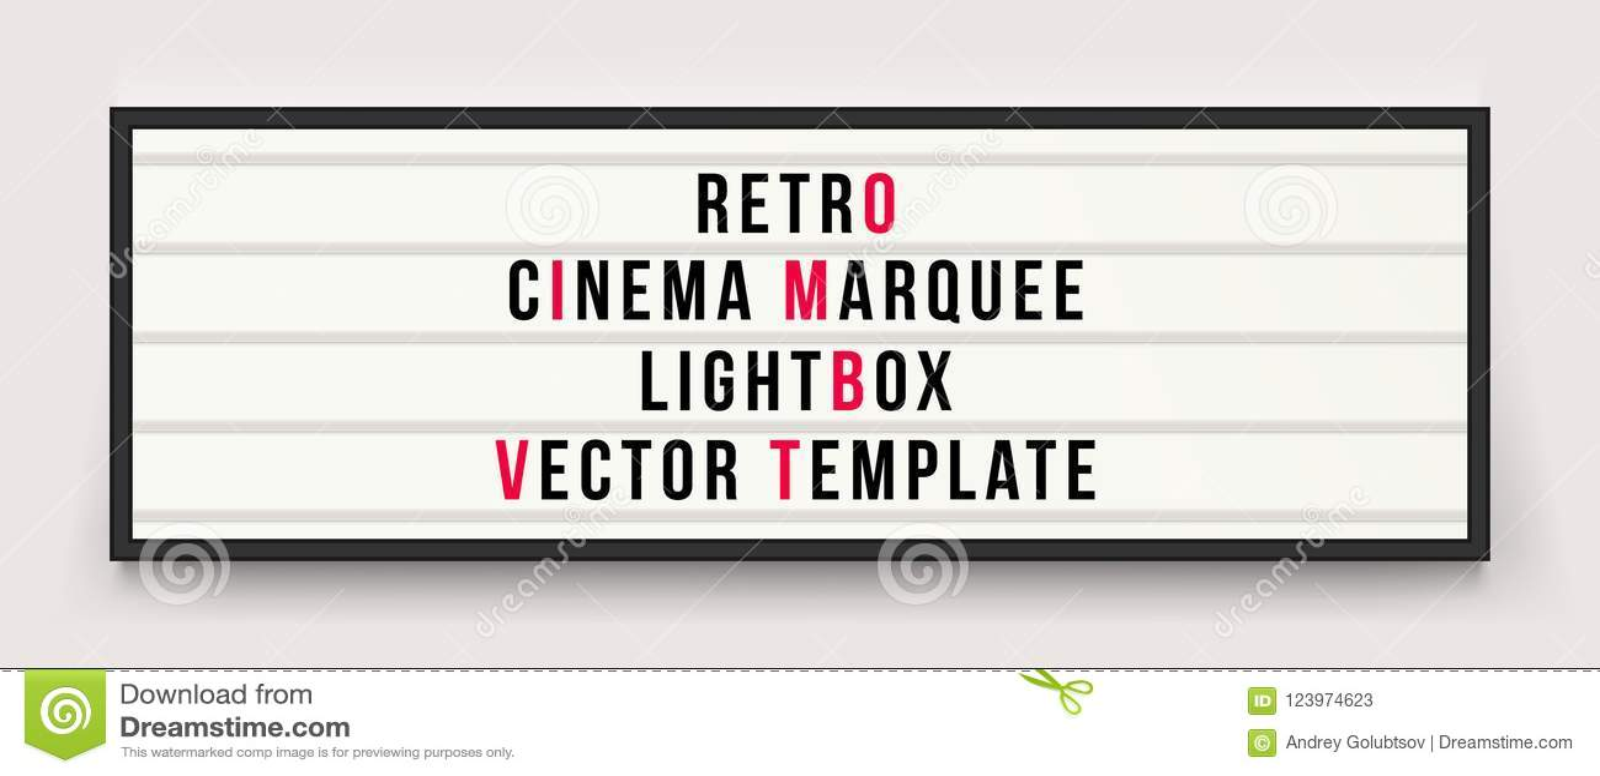 Ретро шаблон вектора lightbox шатёр кино